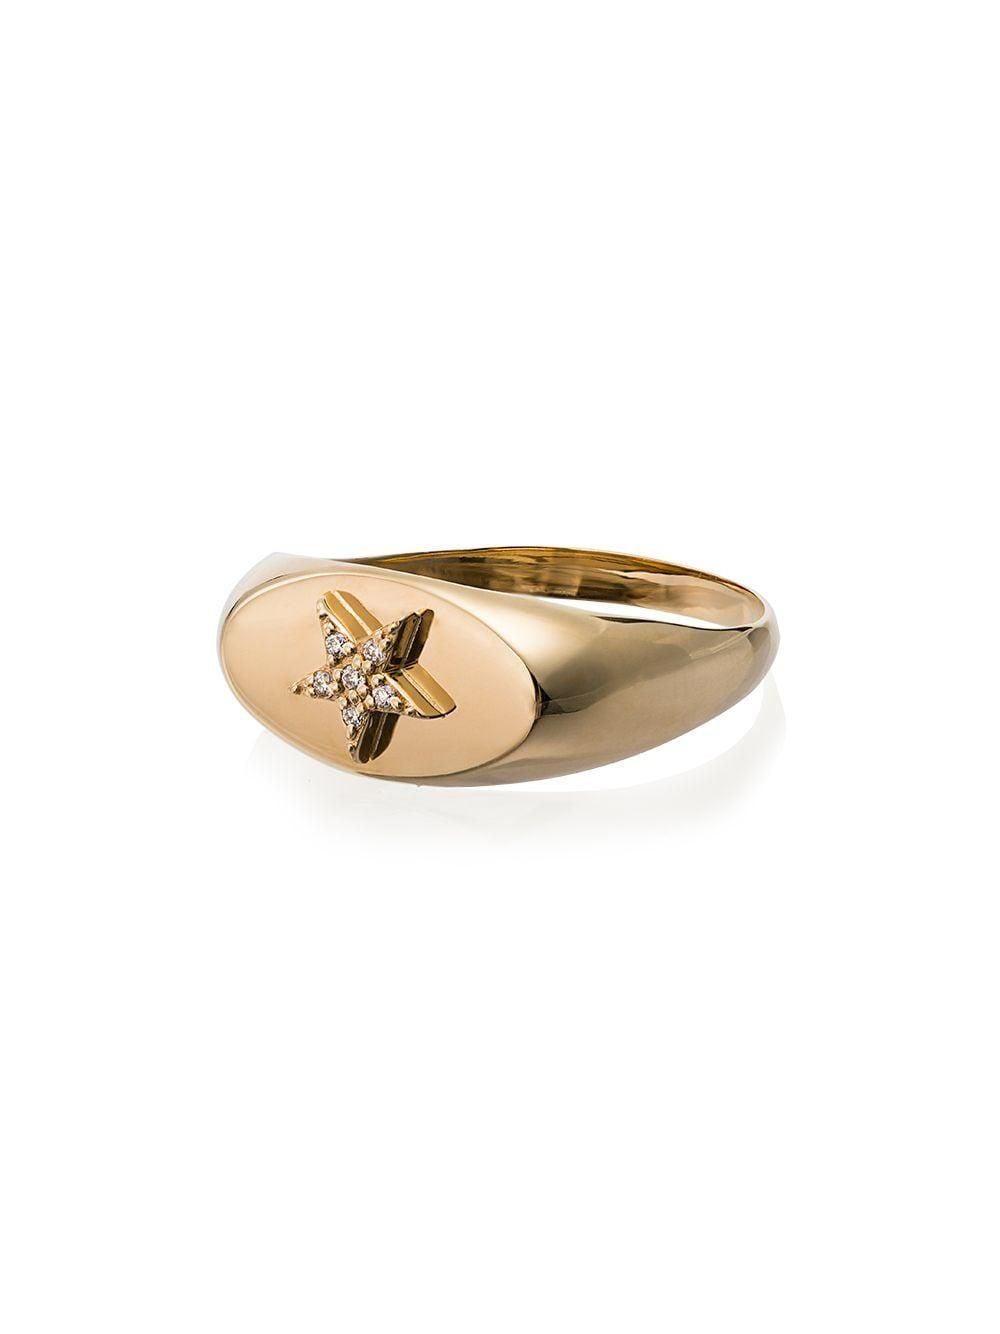 foundare 18kt yellow gold star diamond baby signet ring